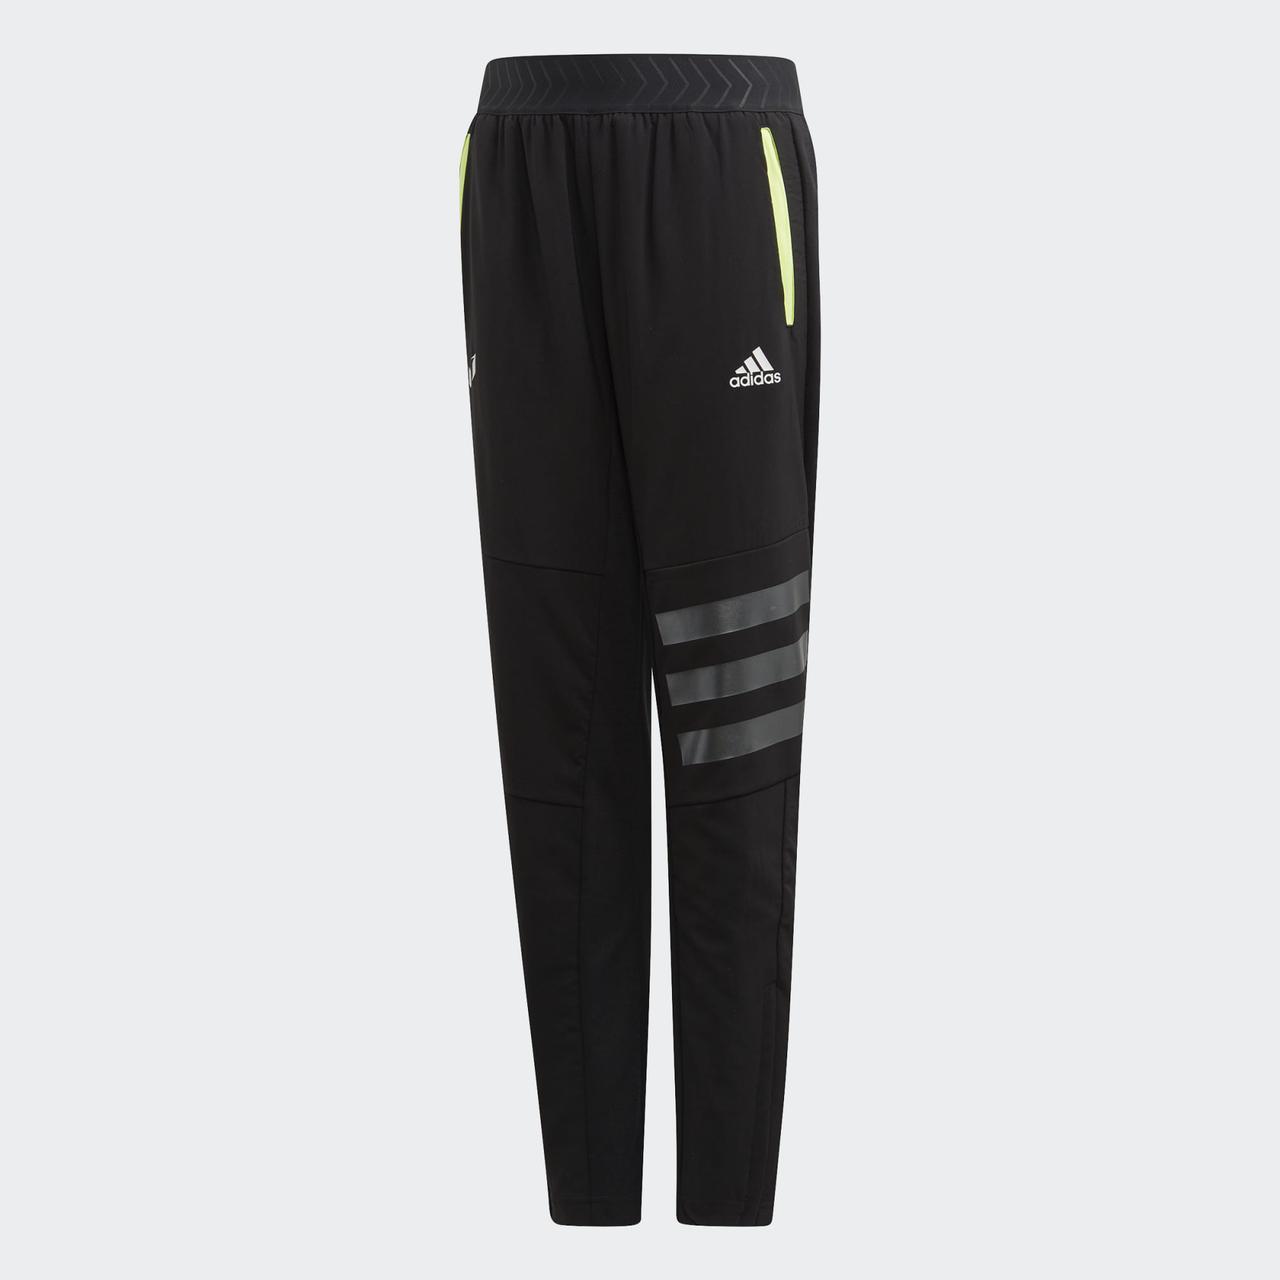 Детские брюки Adidas Performance Messi Striker ED5726